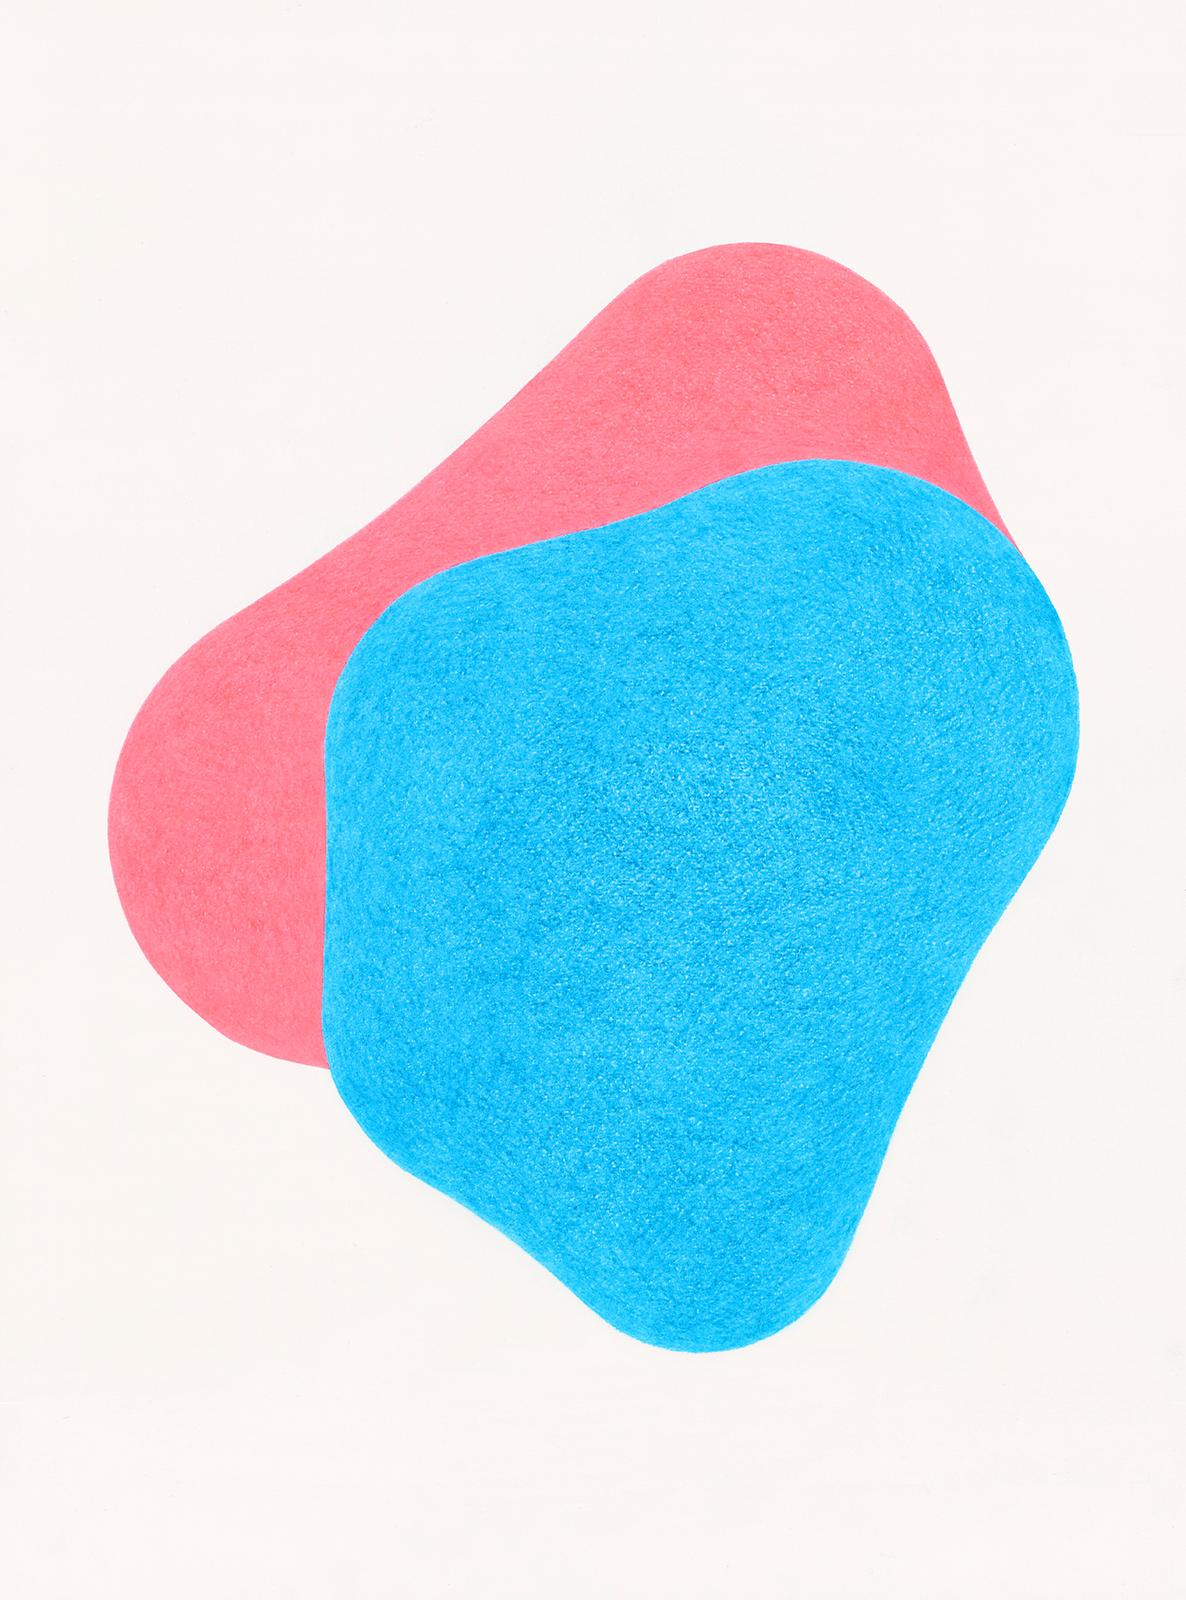 Joachim Jirou-Najou - Drawing - Designer - Work - Design - 49° S, 69° E, Archipels